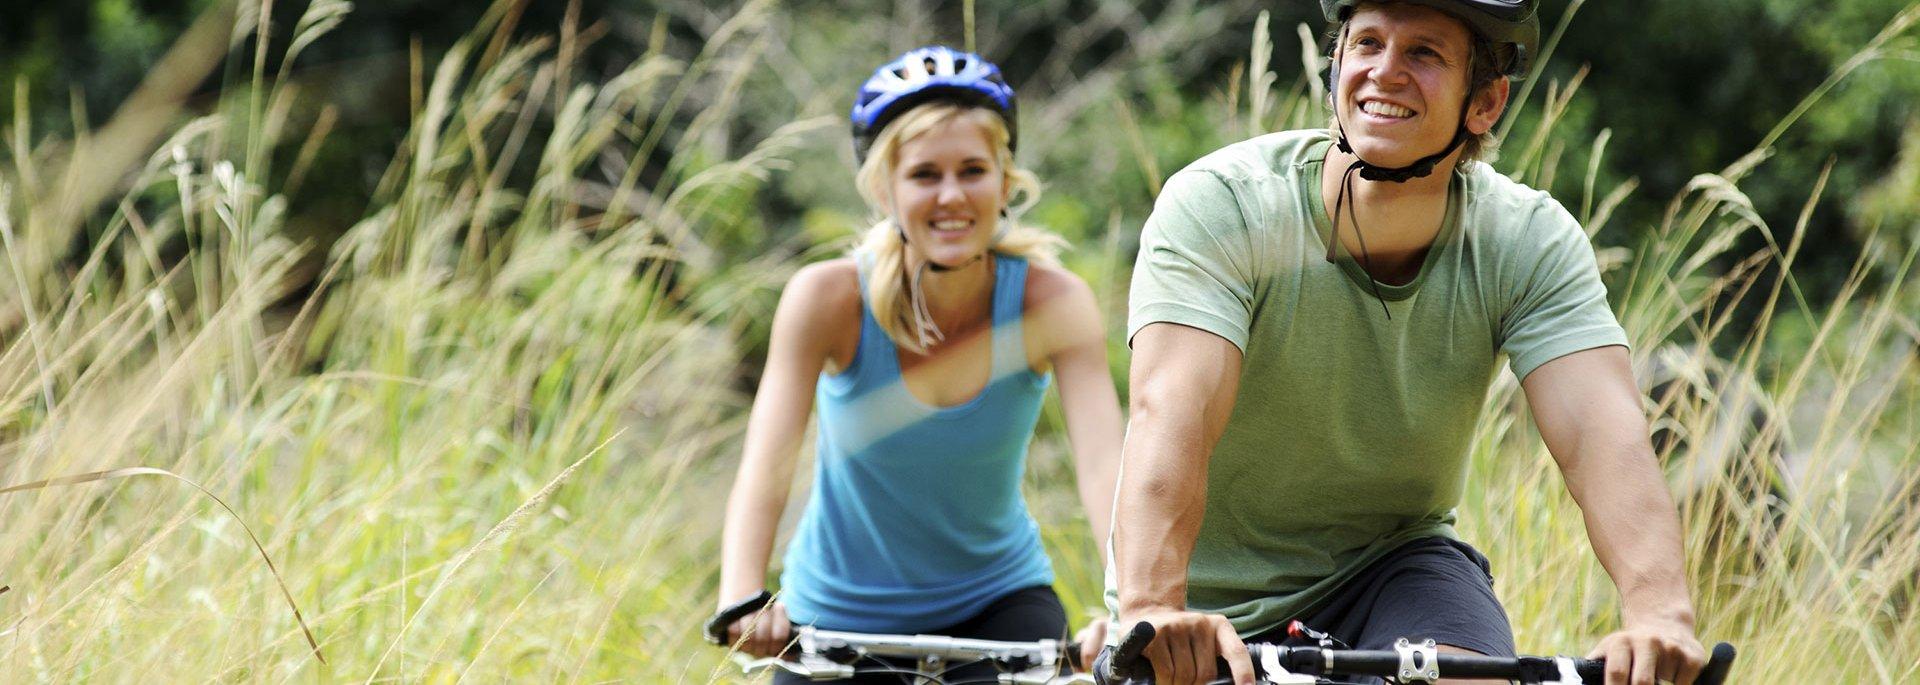 Paar beim Biken